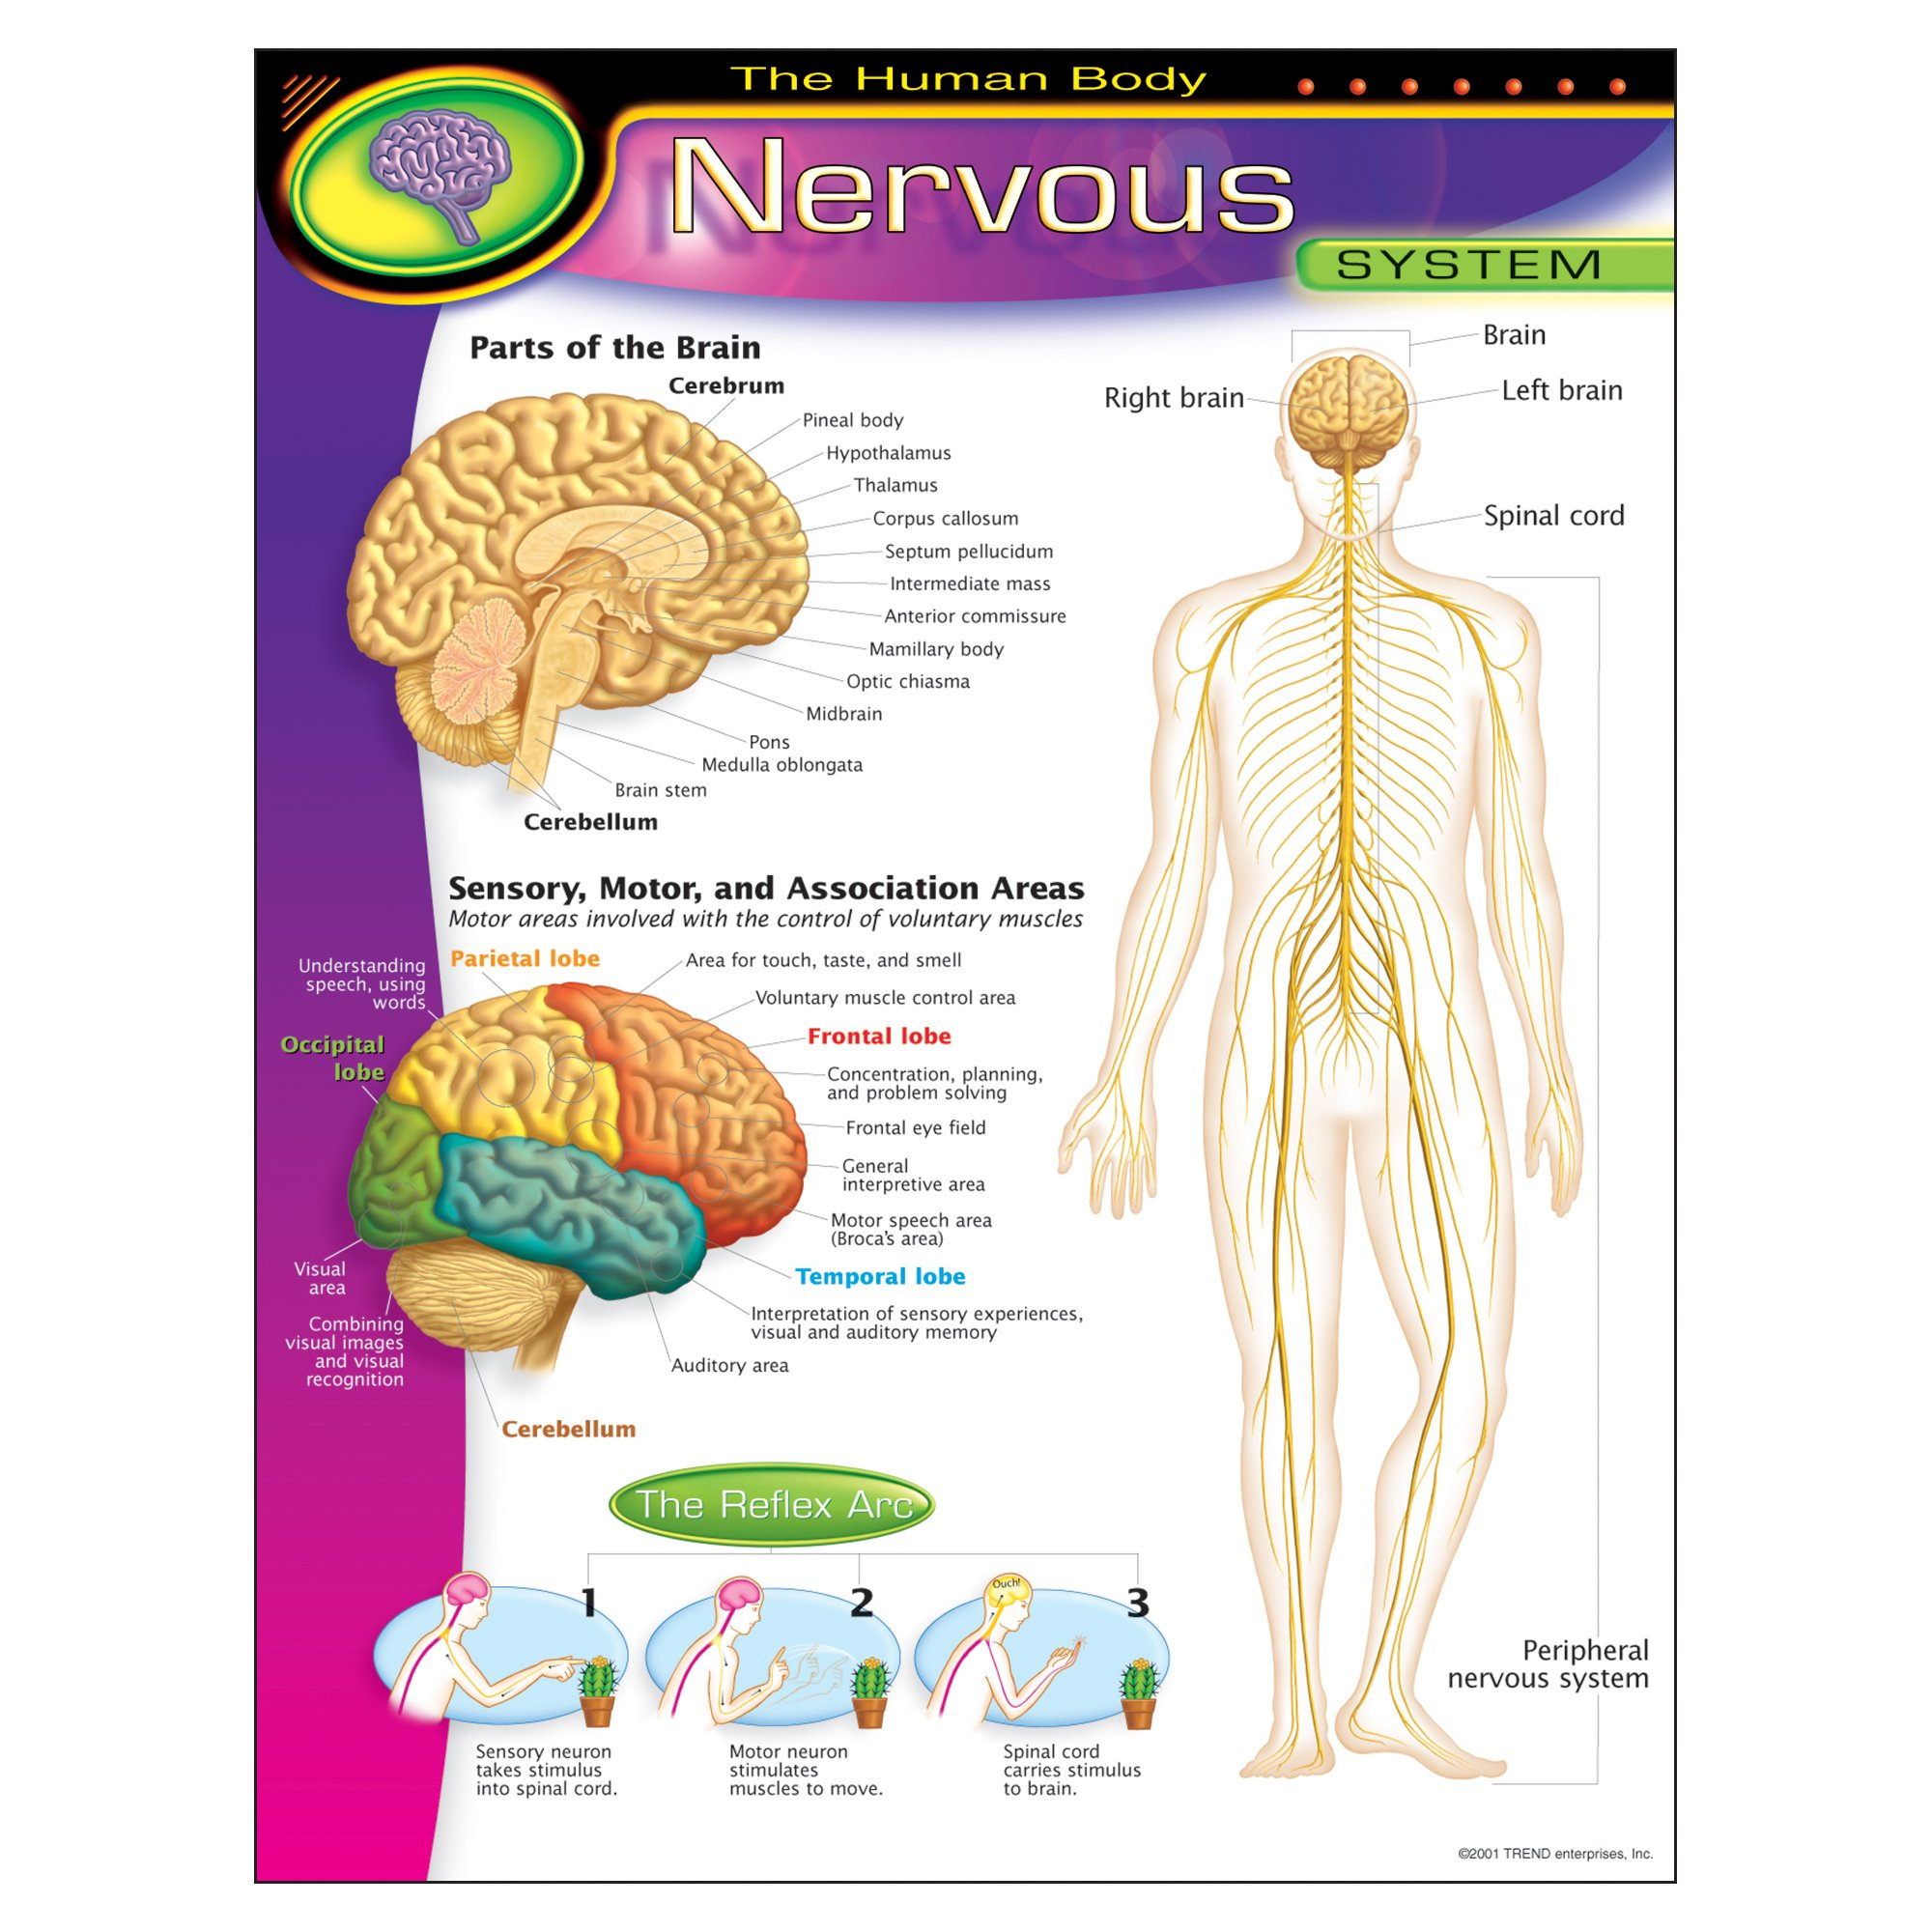 Cheap Human Body Nervous System Find Human Body Nervous System